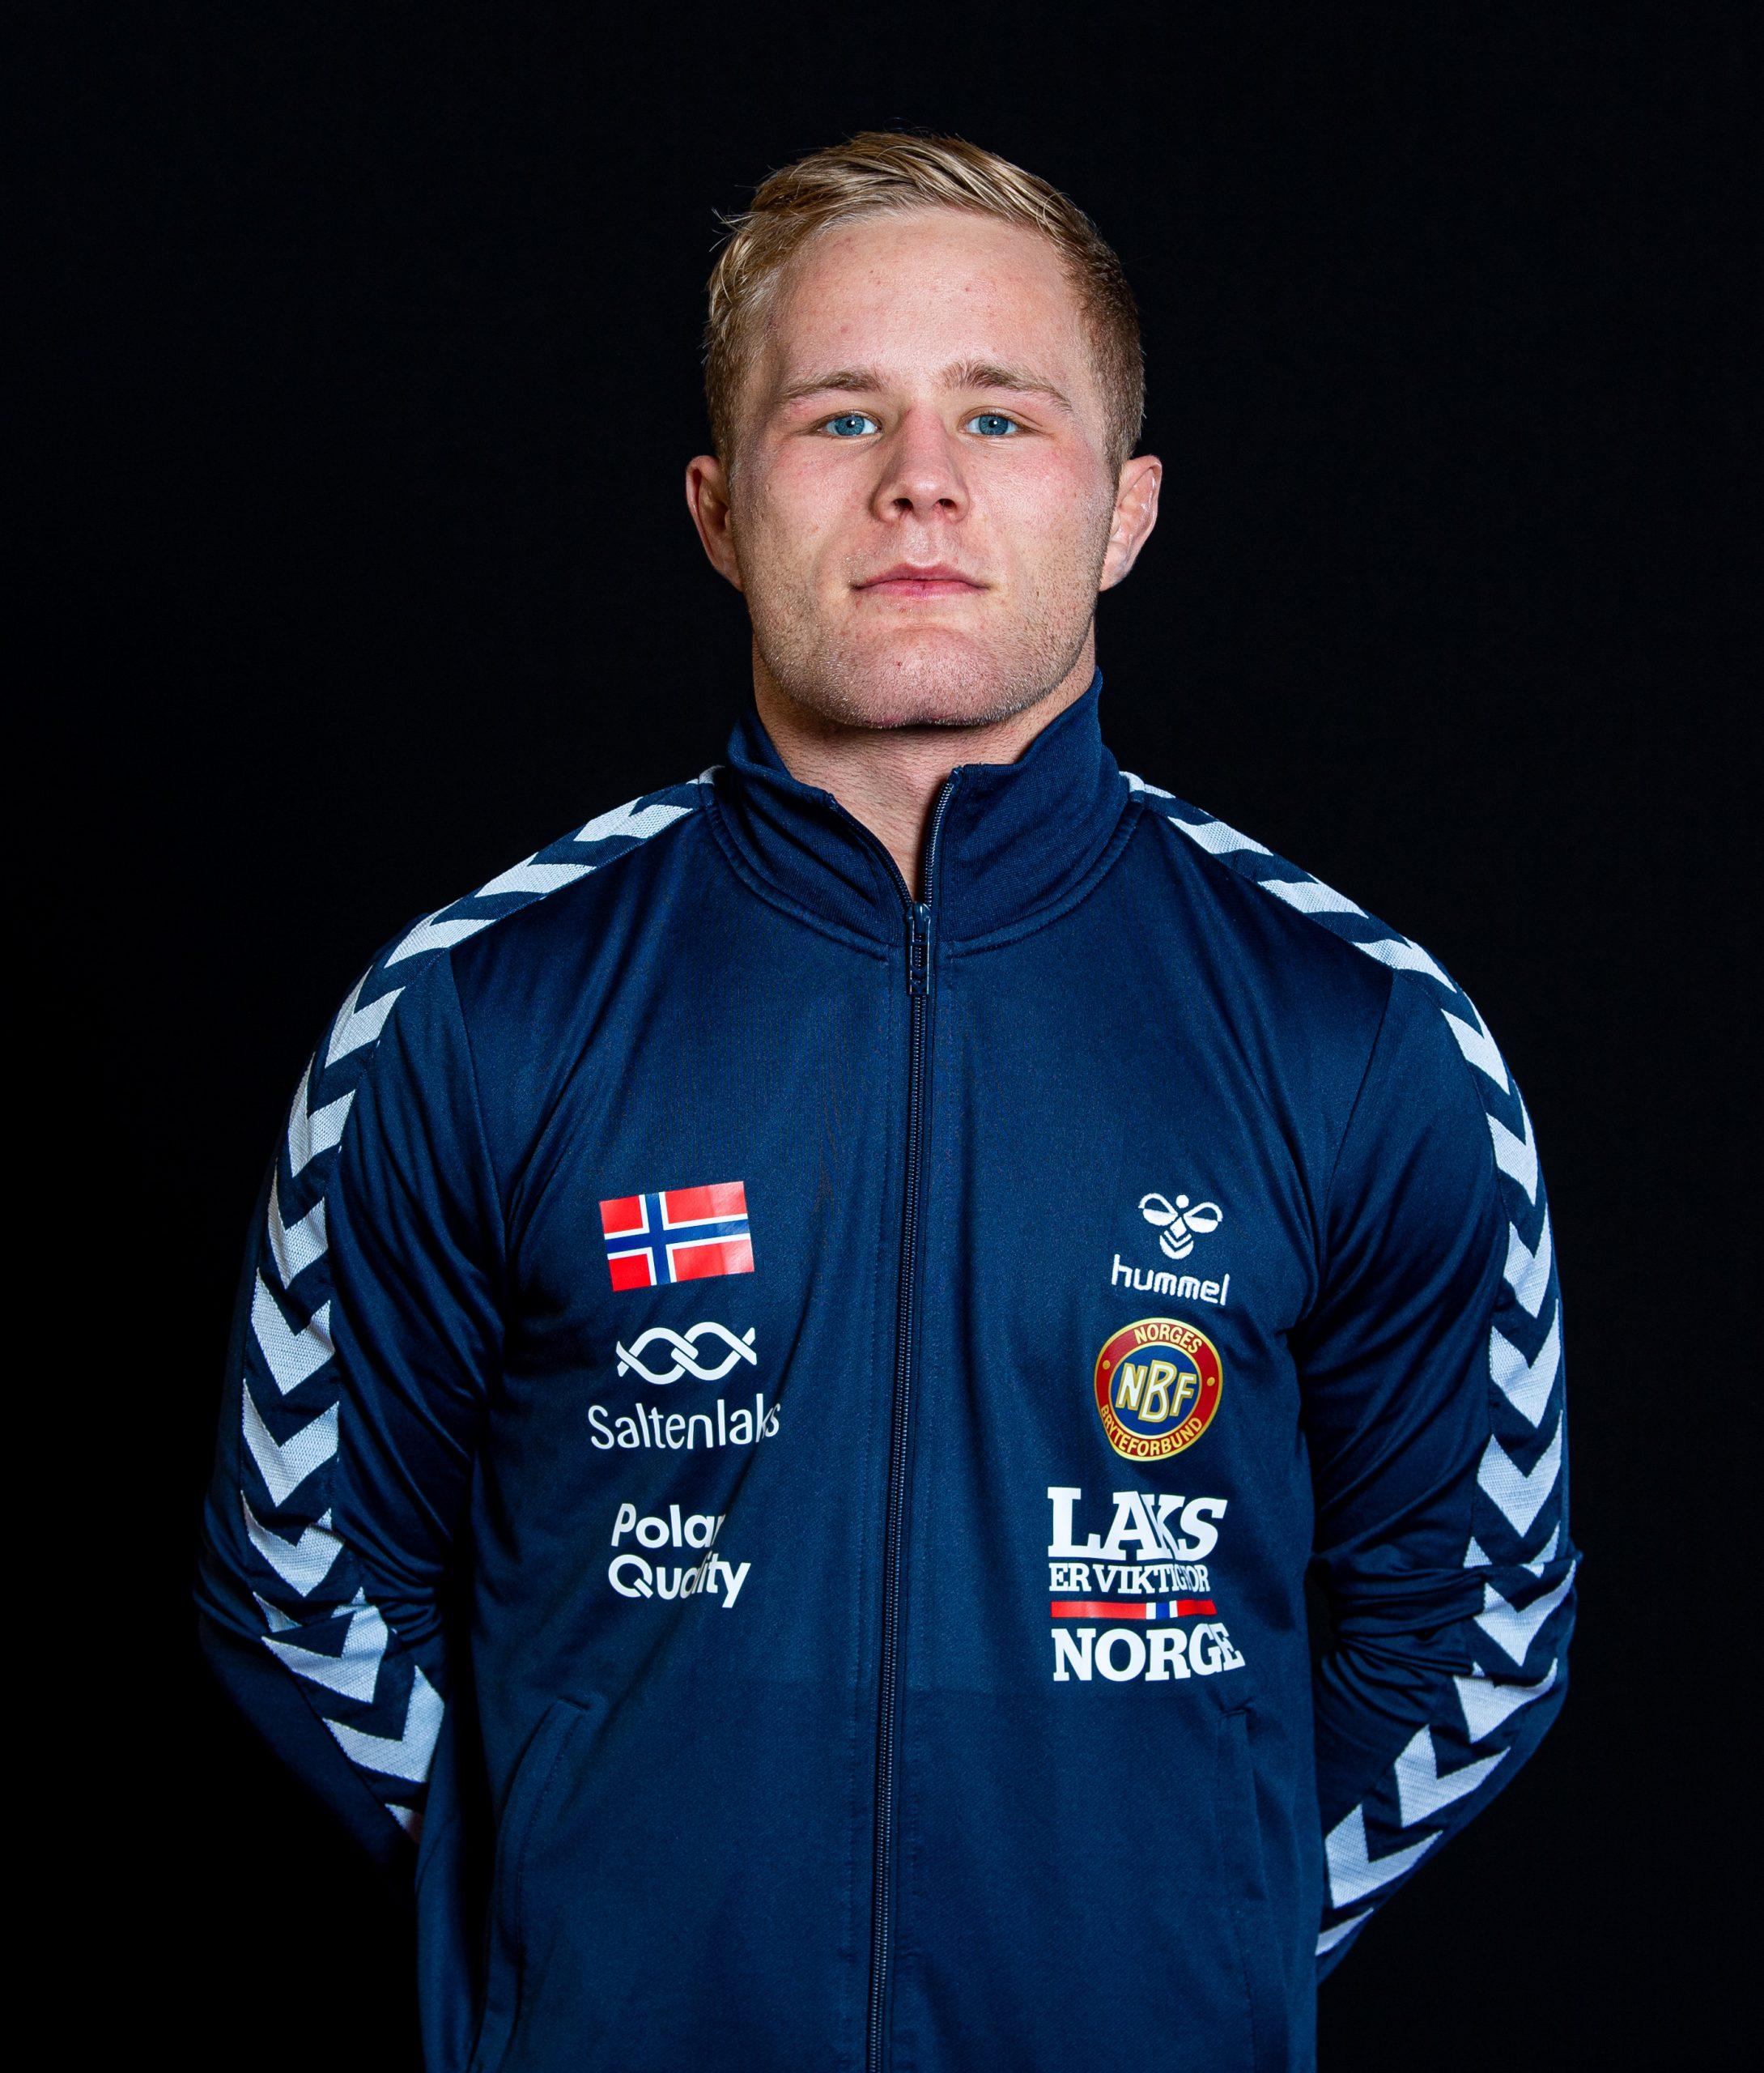 Morten Thoresen